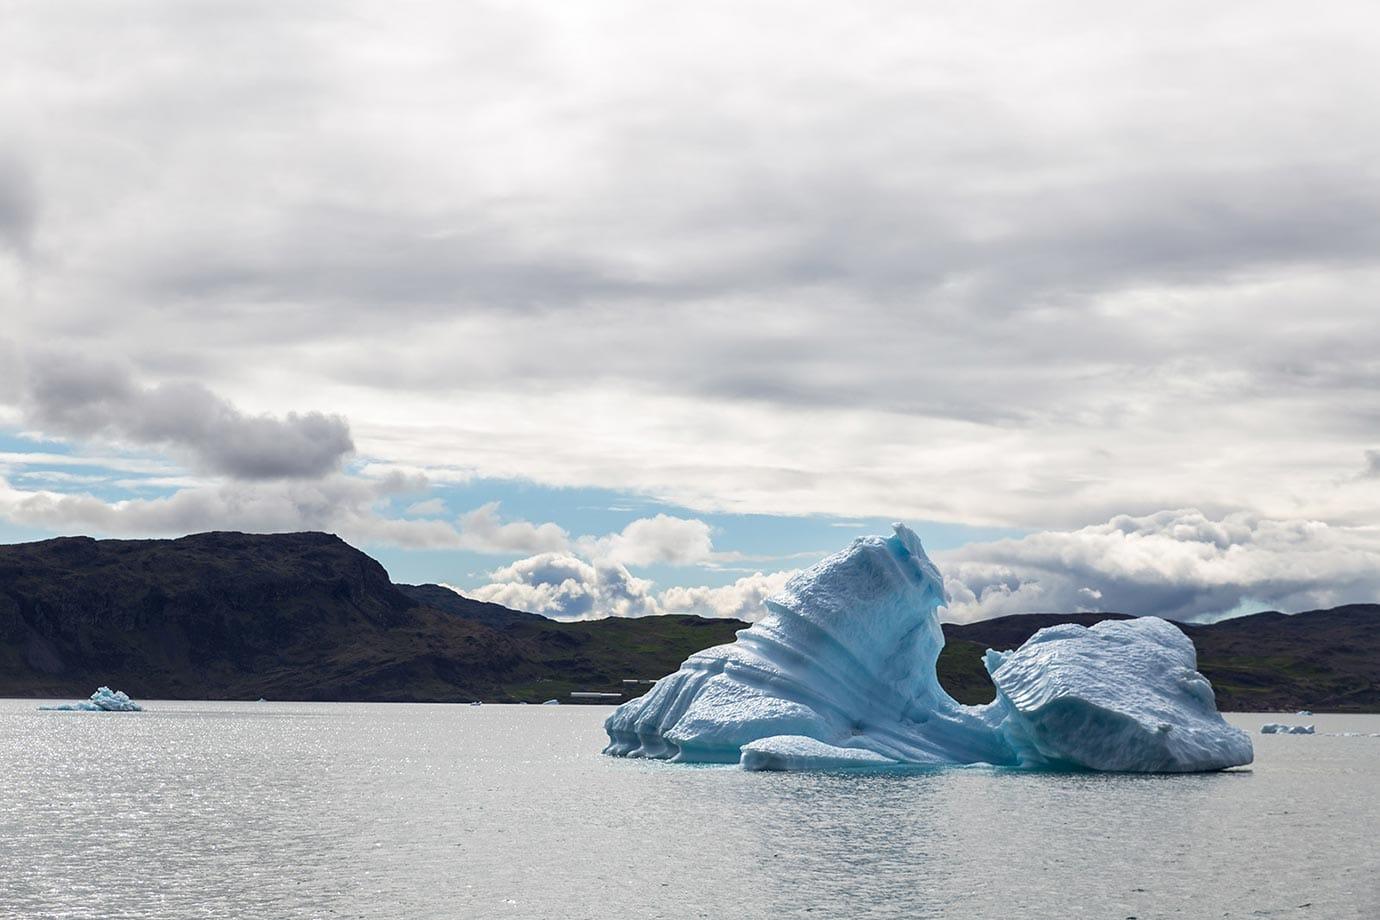 Icebergs near Narsaq and Narsarsuaq in Southern Greenland